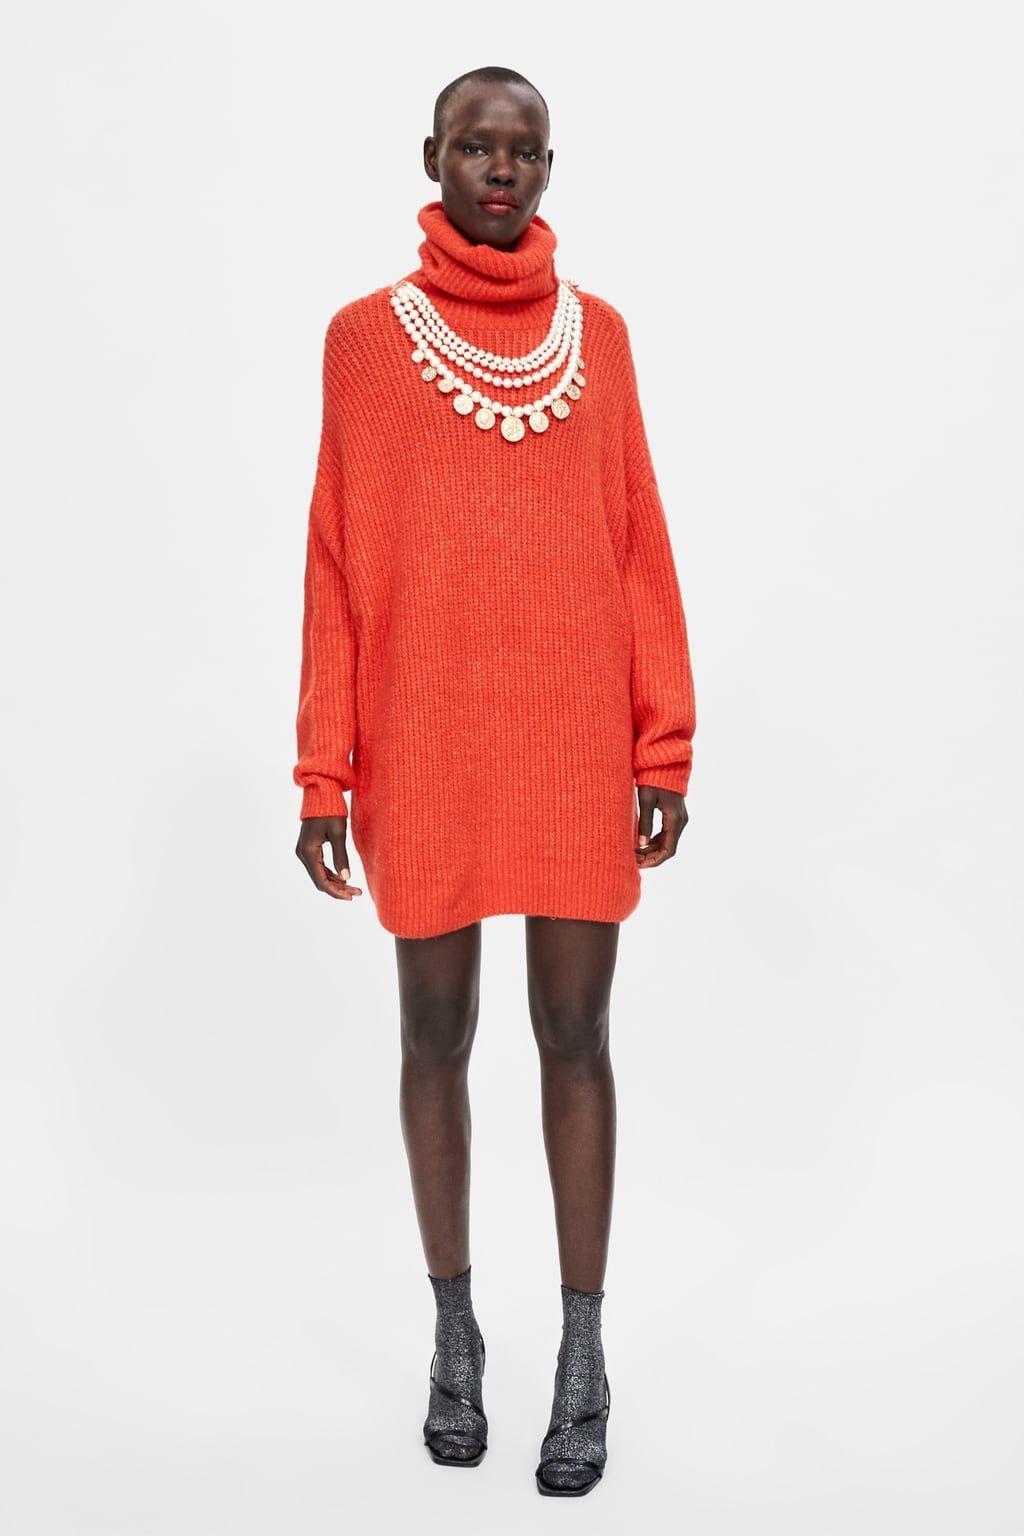 JERSEY OVERSIZE Jersey Oversize, Zara, Knitwear, Pullover, Real Life, Fall  Winter 2b79618940